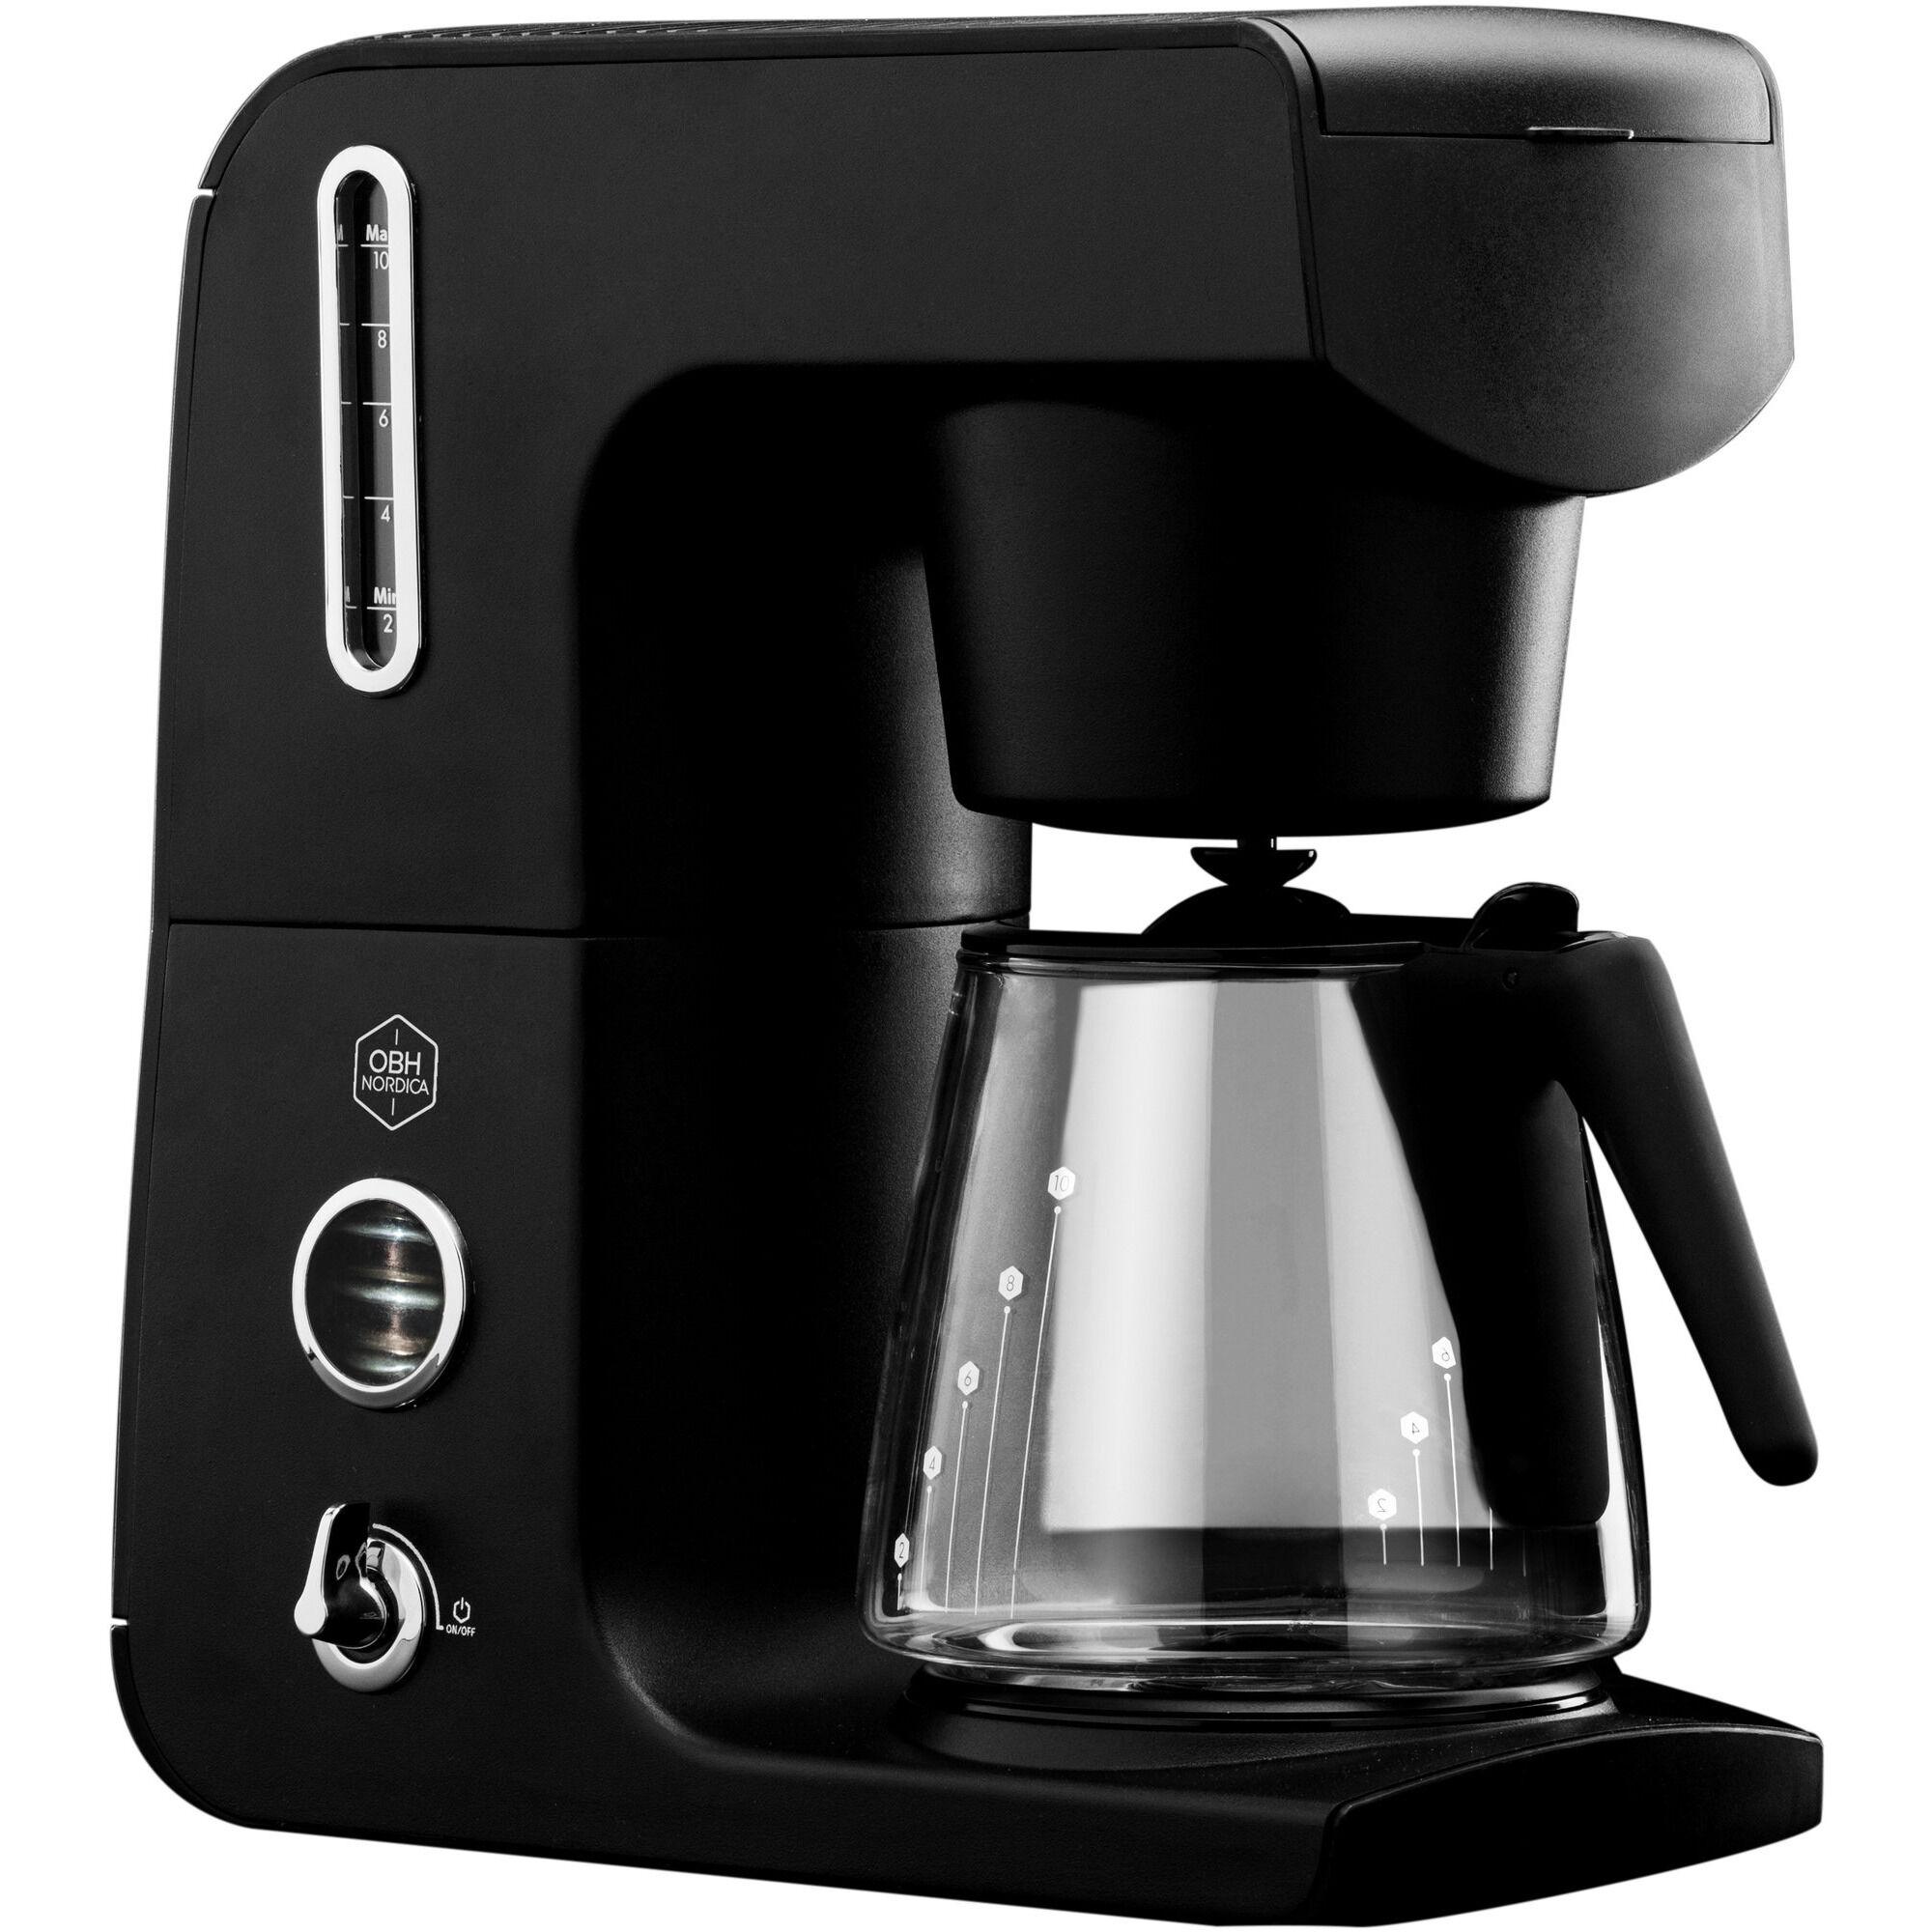 OBH Nordica LEGACY Kaffemaskine, sort